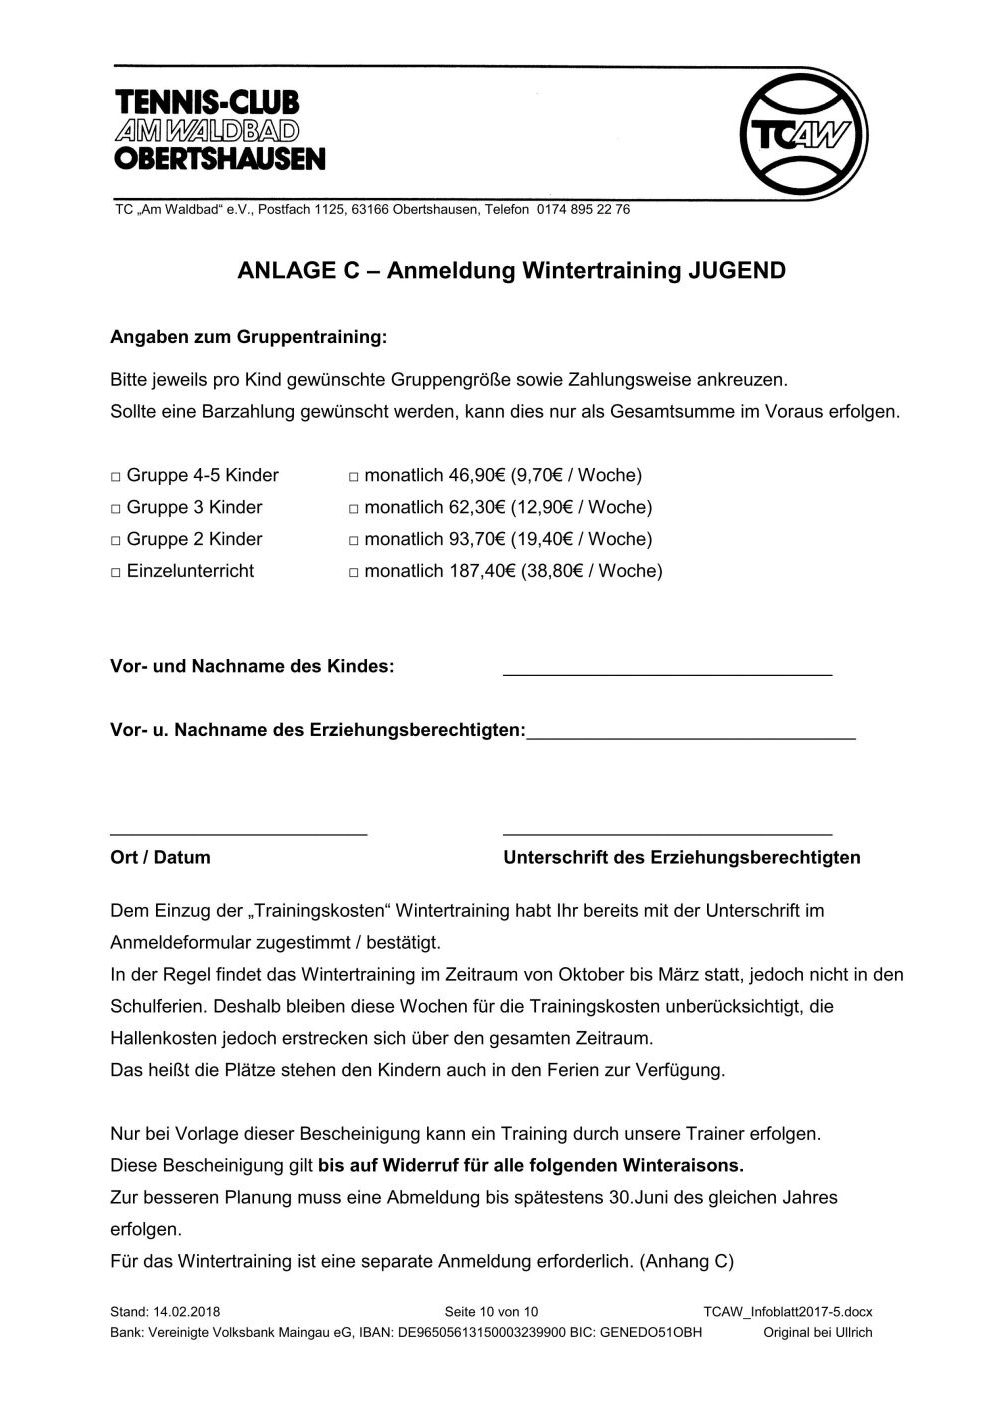 2017_Mitgliedsantrag-Training-Jugend_V2_03_1000x1414